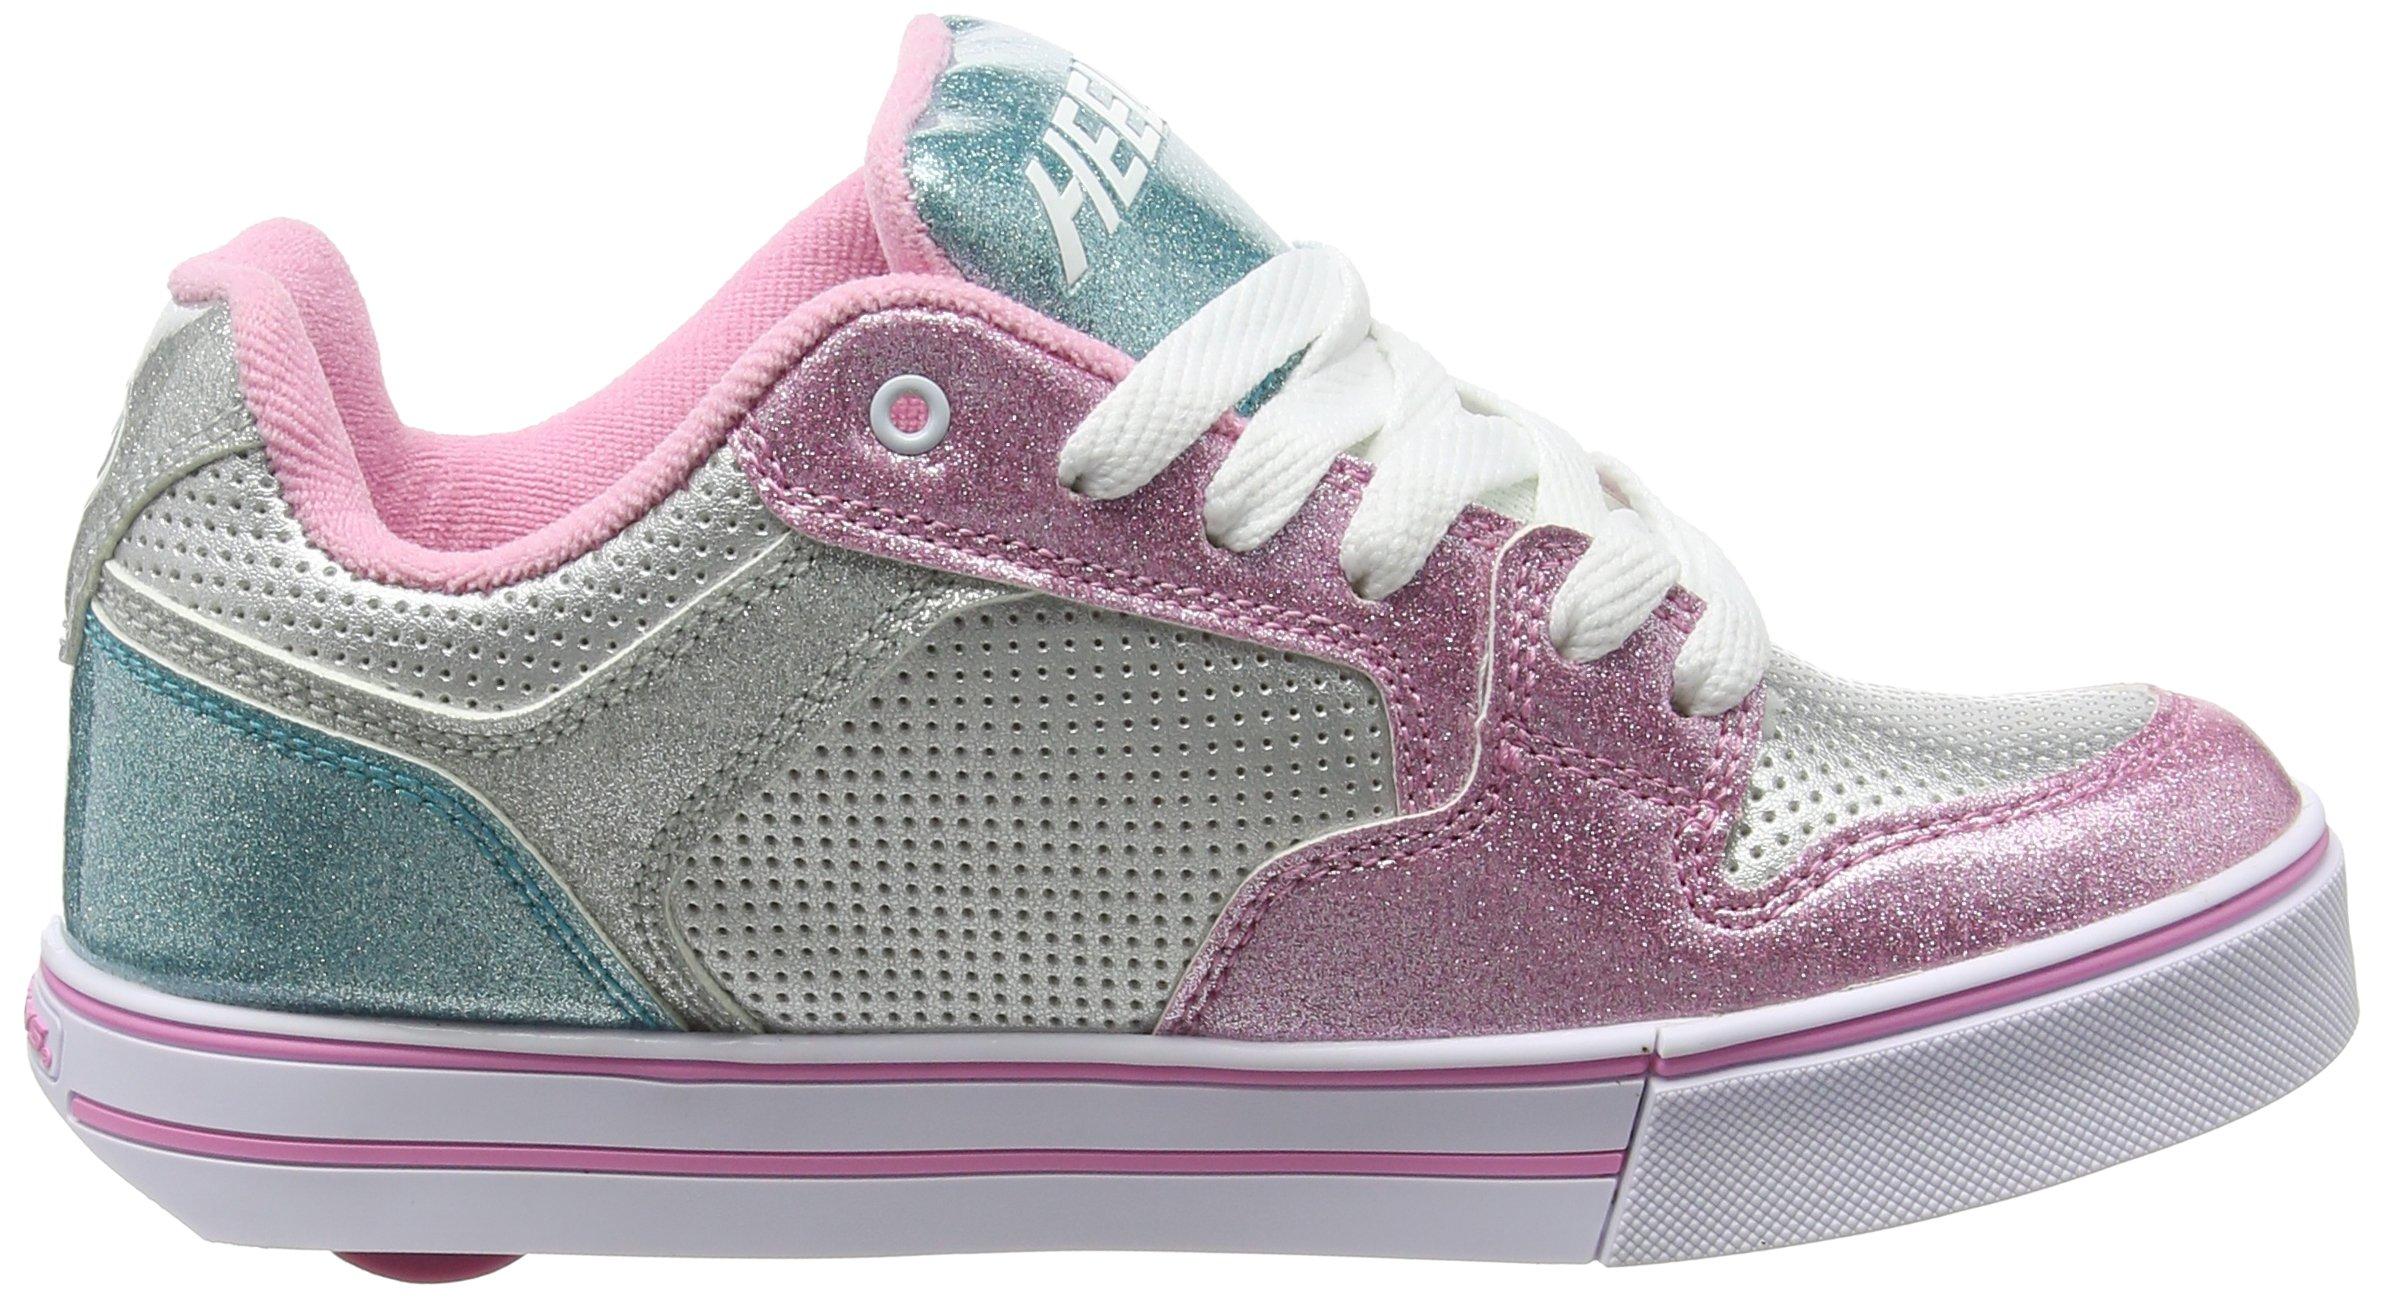 Heelys Girl's Motion Plus (Little Kid/Big Kid/Adult) Silver/Pink/Blue/Glitter Shoe by Heelys (Image #6)